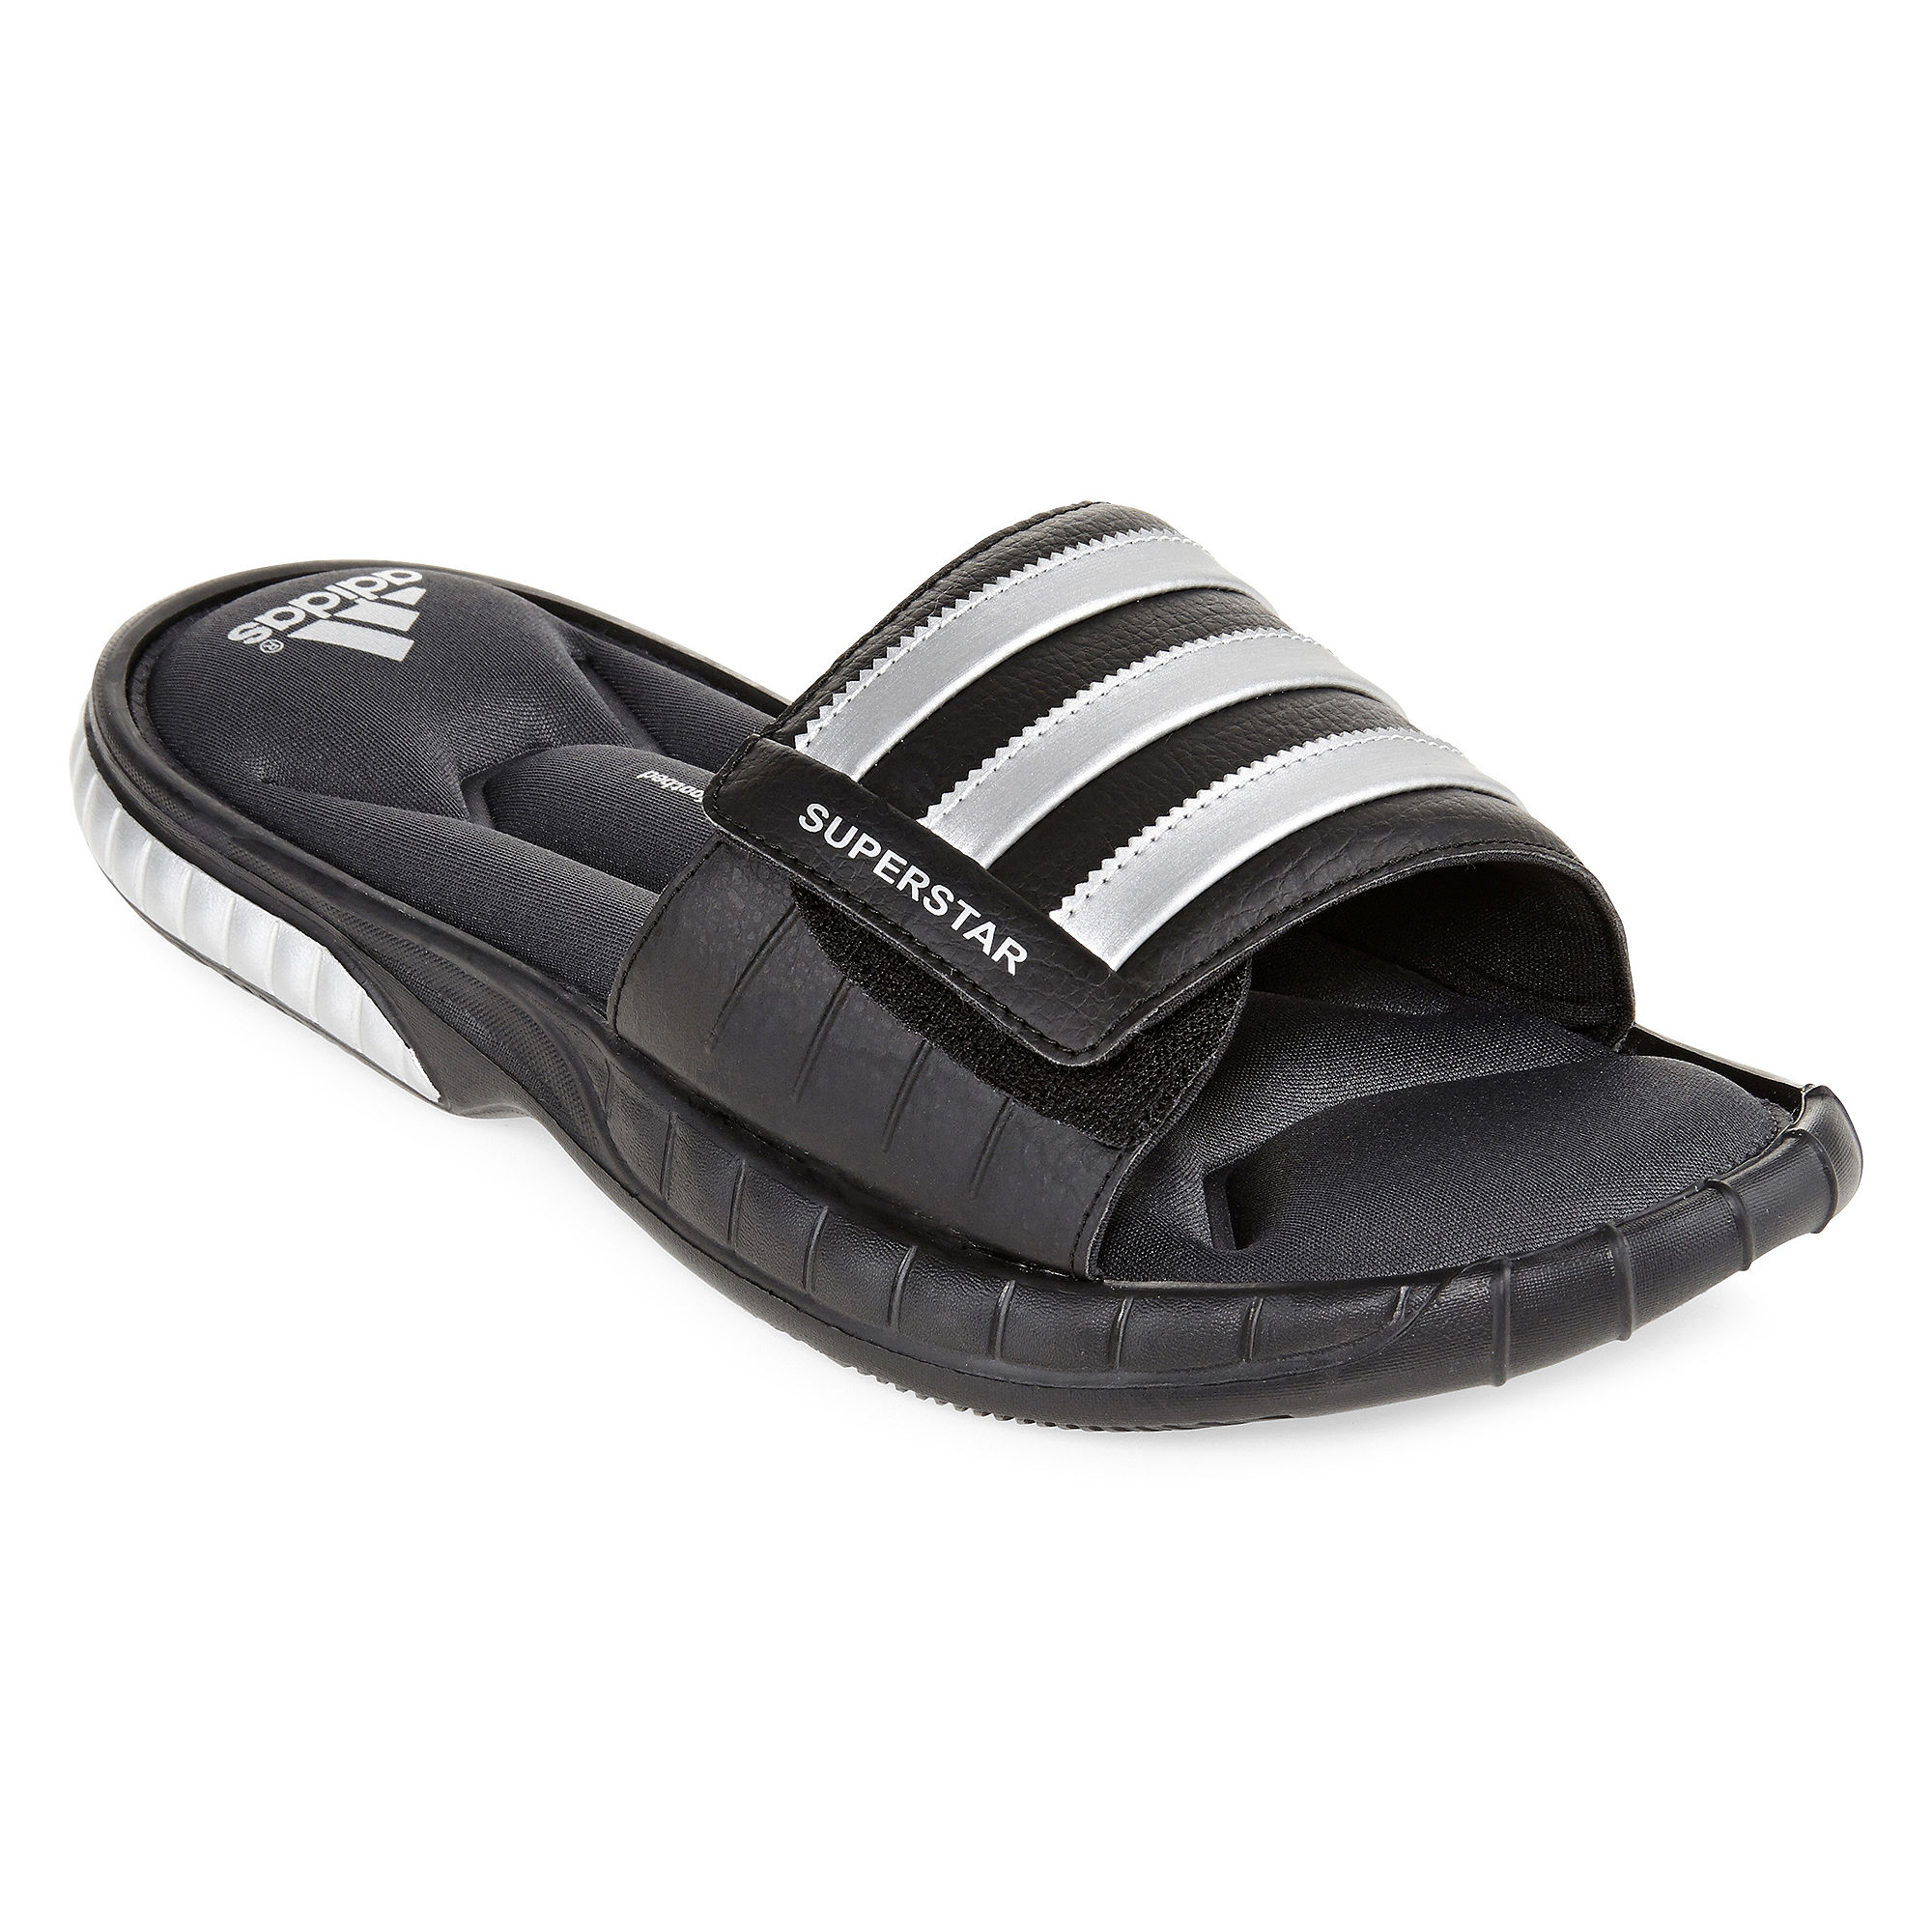 e210df4a42d20 UPC 886037162429. ZOOM. UPC 886037162429 has following Product Name  Variations  Adidas Superstar 3g Slide Men Us 10 Black Flip Flop Sandal ...